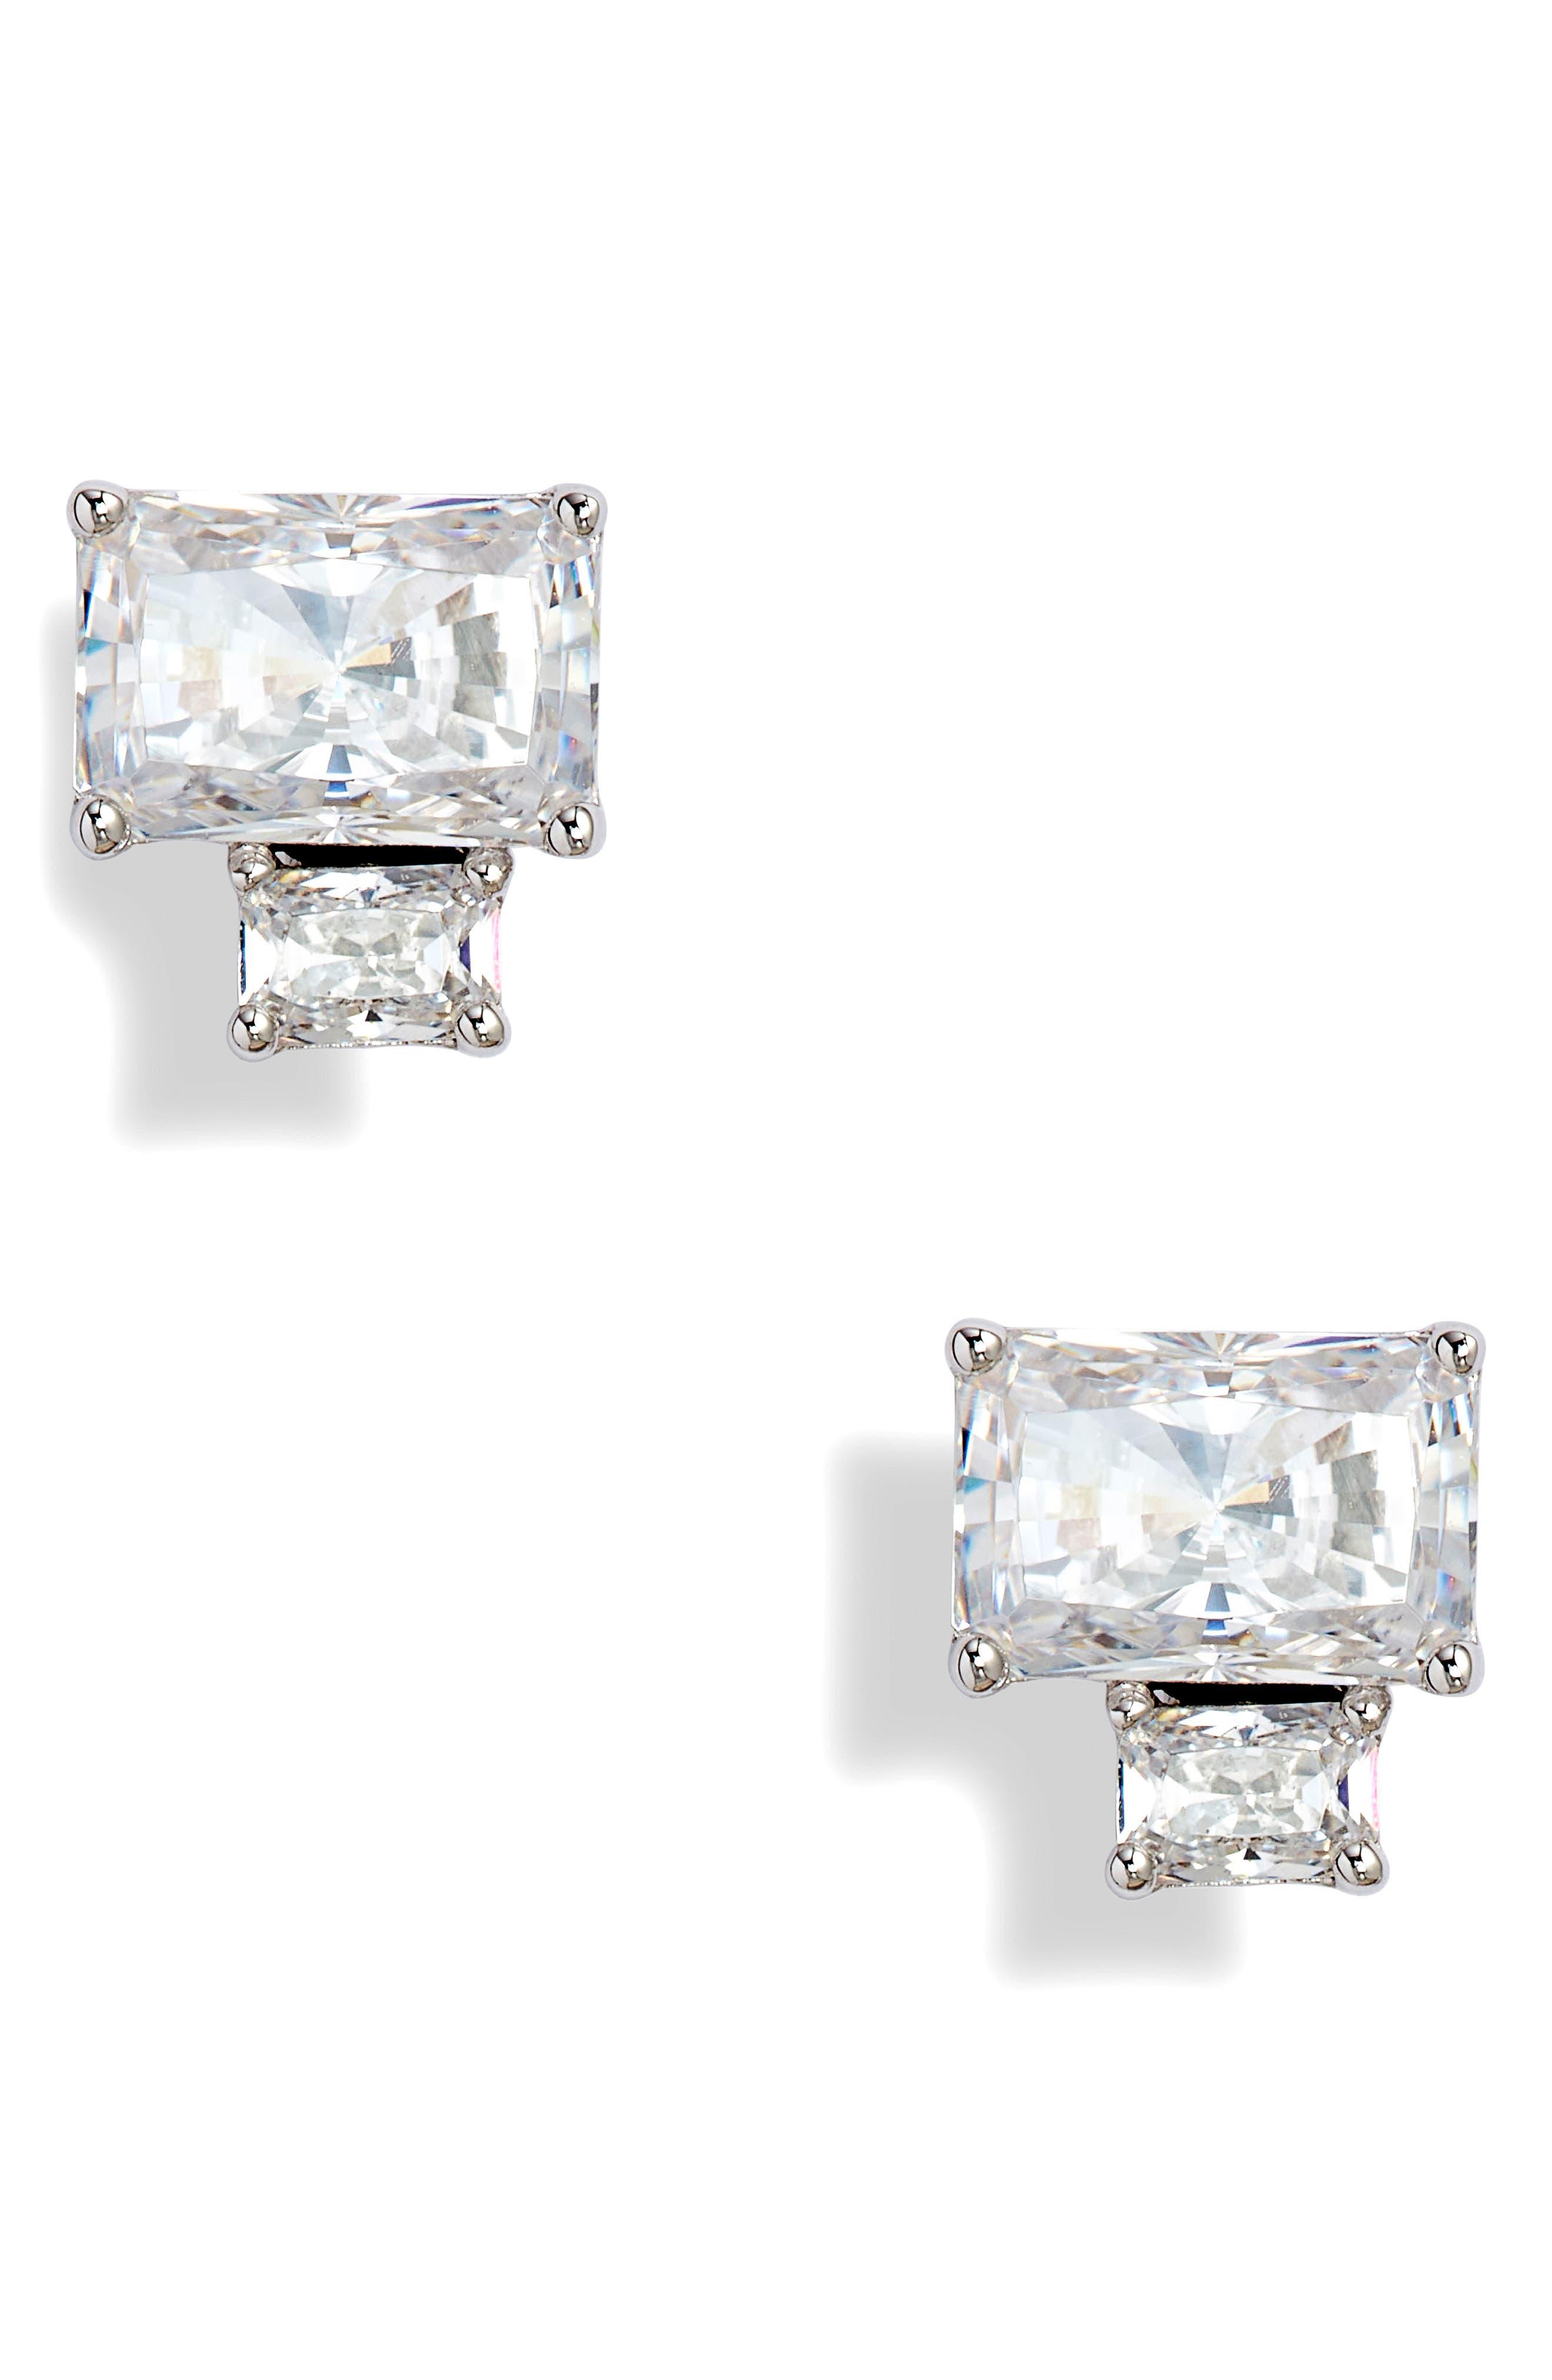 NADRI Baguette Cut Crystal Stud Earrings in White